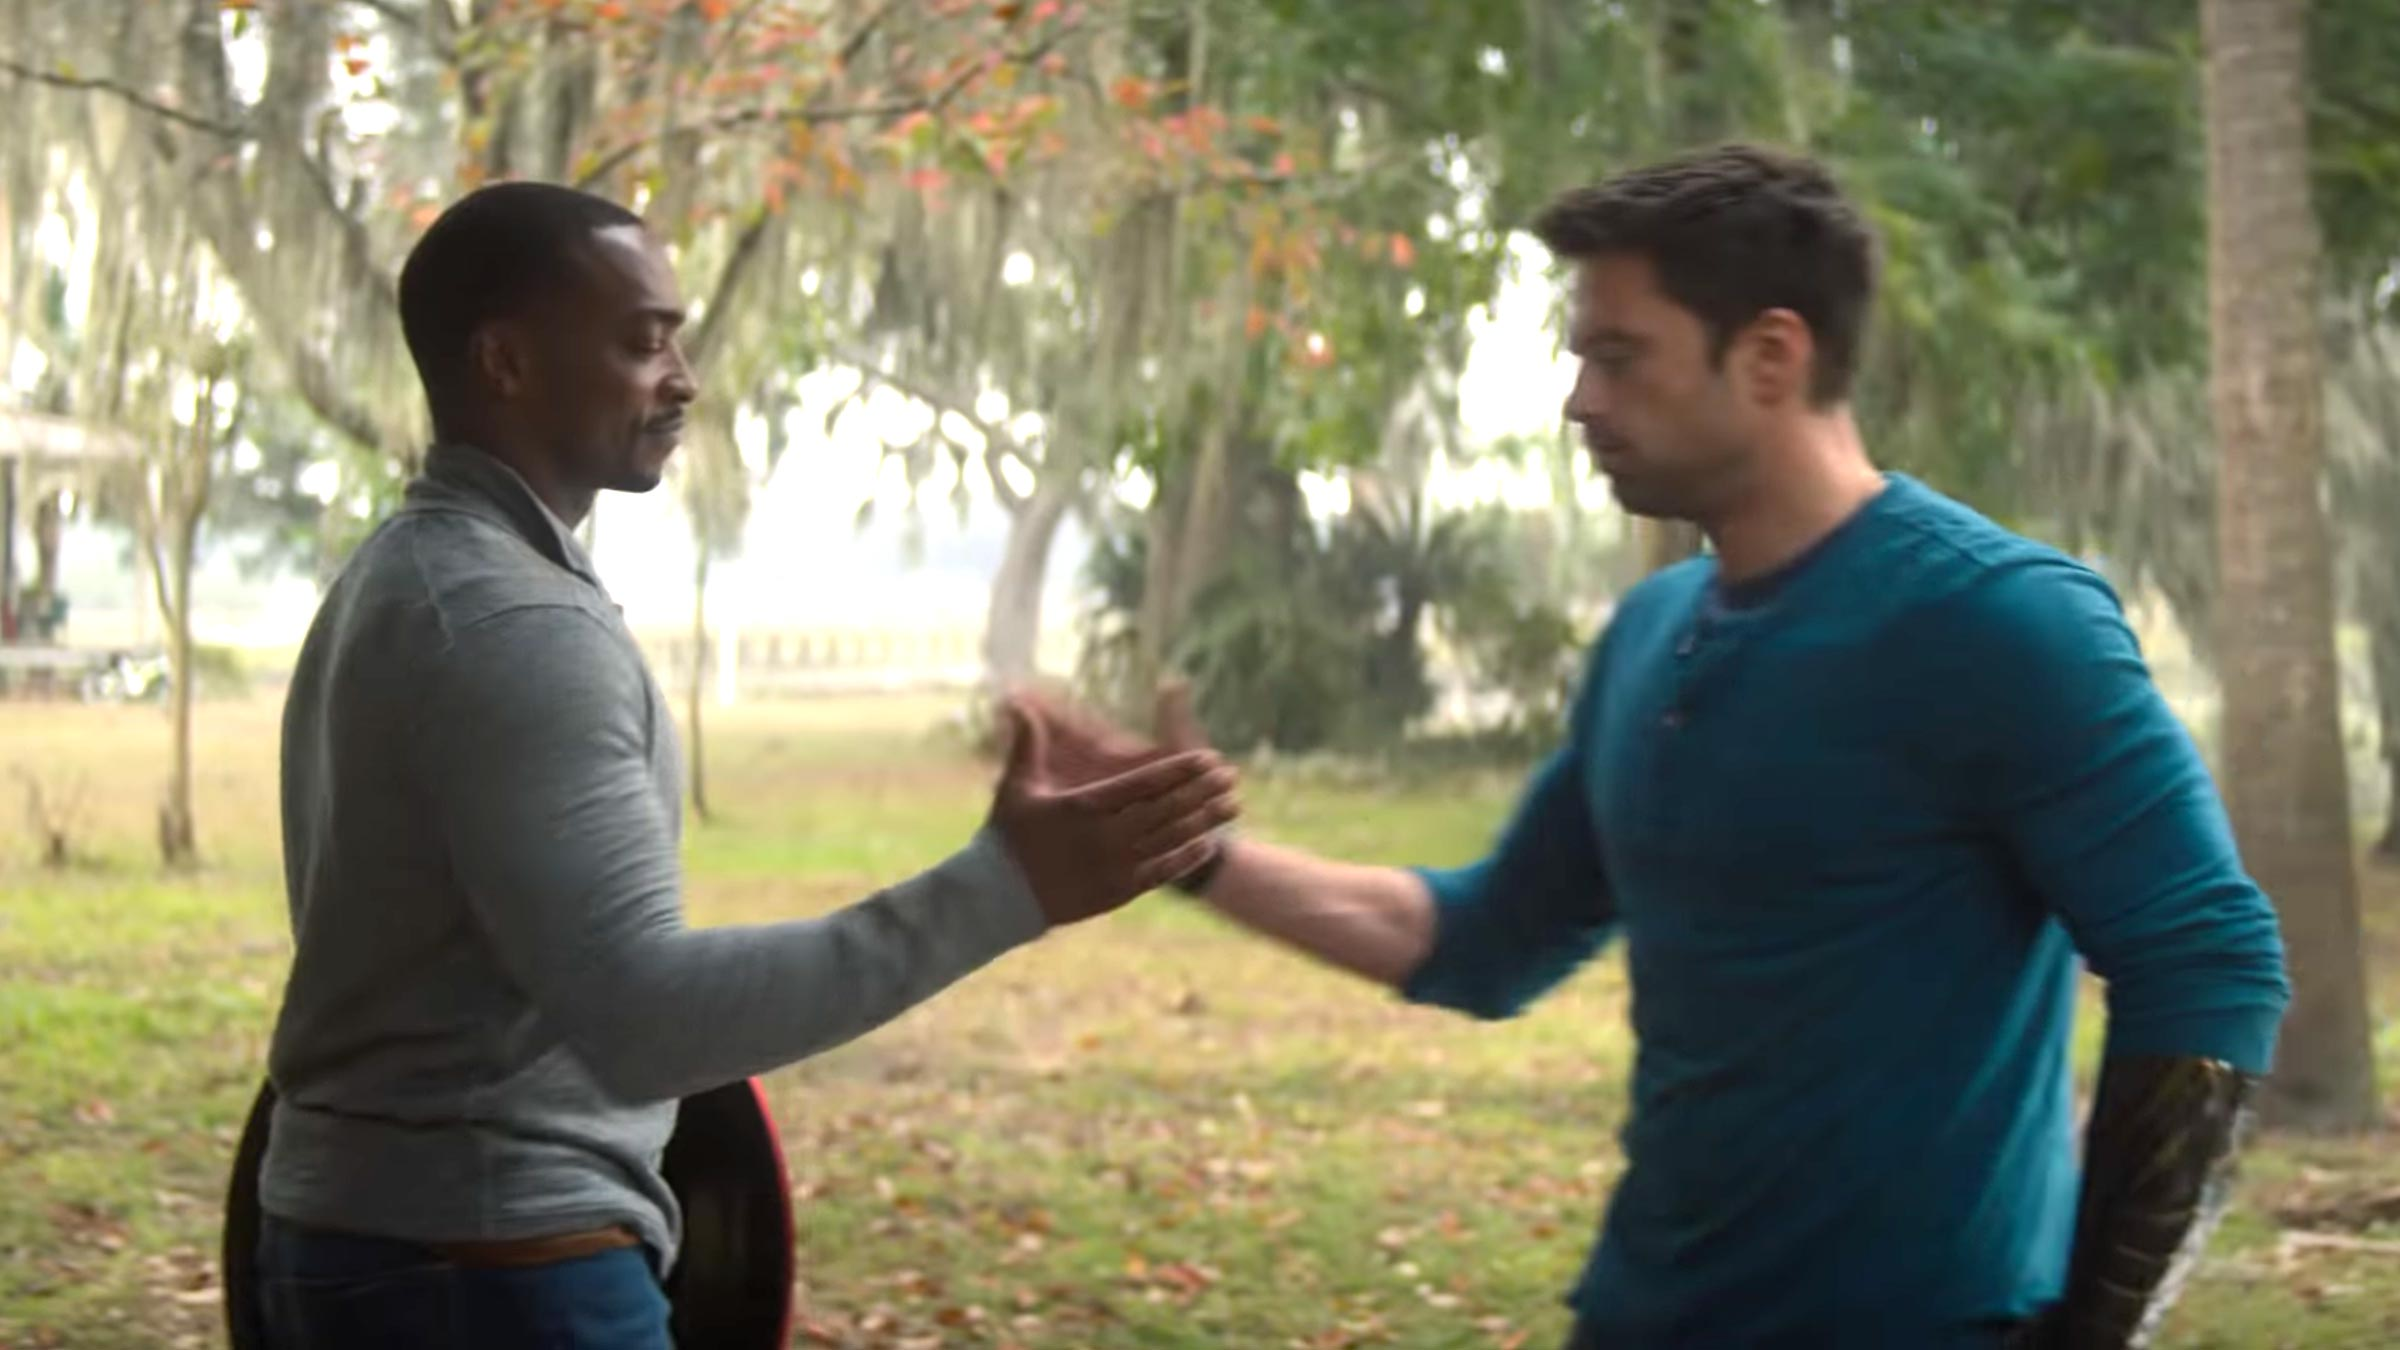 Disney+ Kejutkan Dengan Trailer Marvel Terbaru di Super Bowl Untuk Loki, Wanda, Vision, dan Falcon